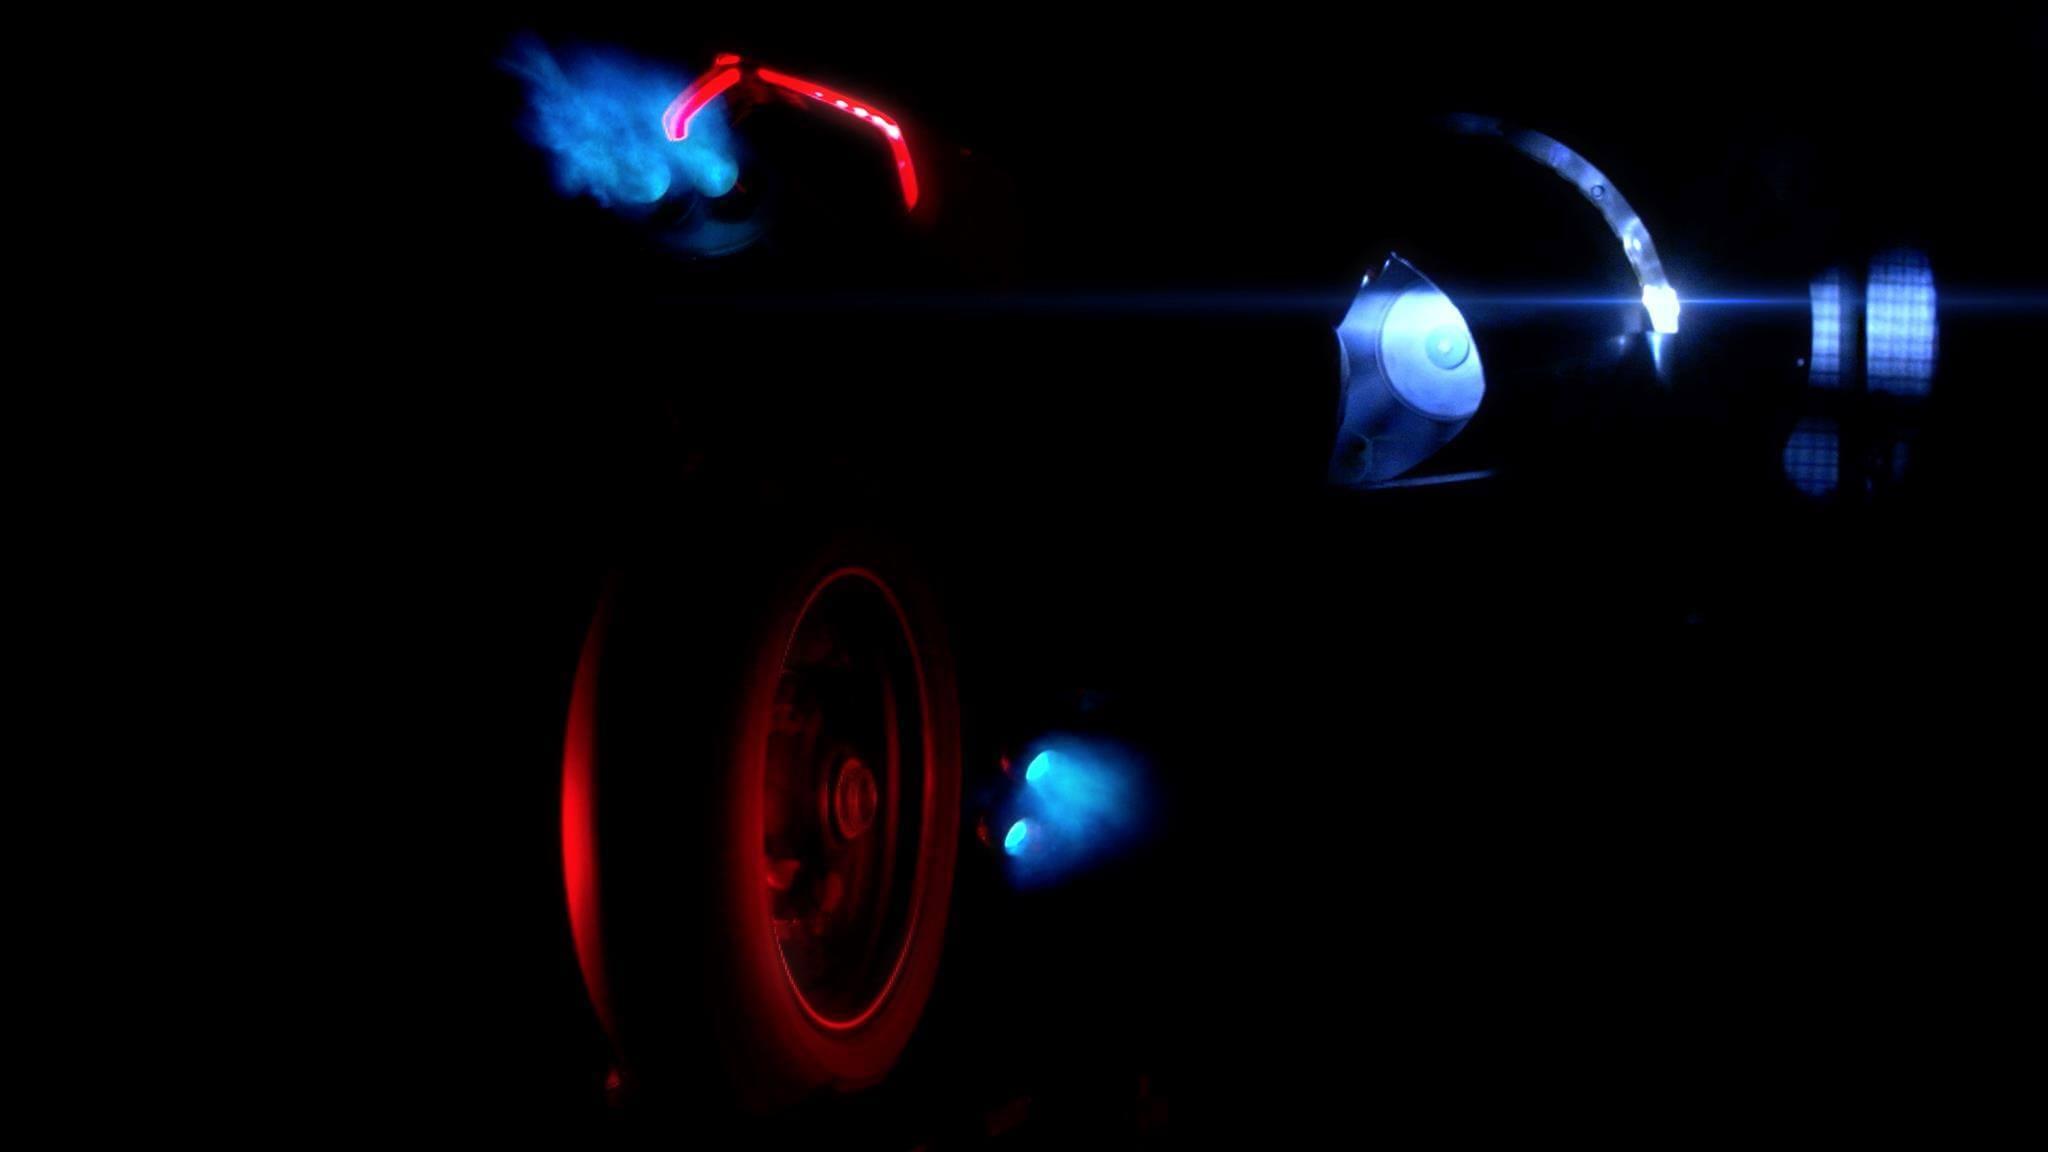 ★Termignoni(テルミニョーニ) パニガーレV4専用のエキゾースト「4uscite」を発表